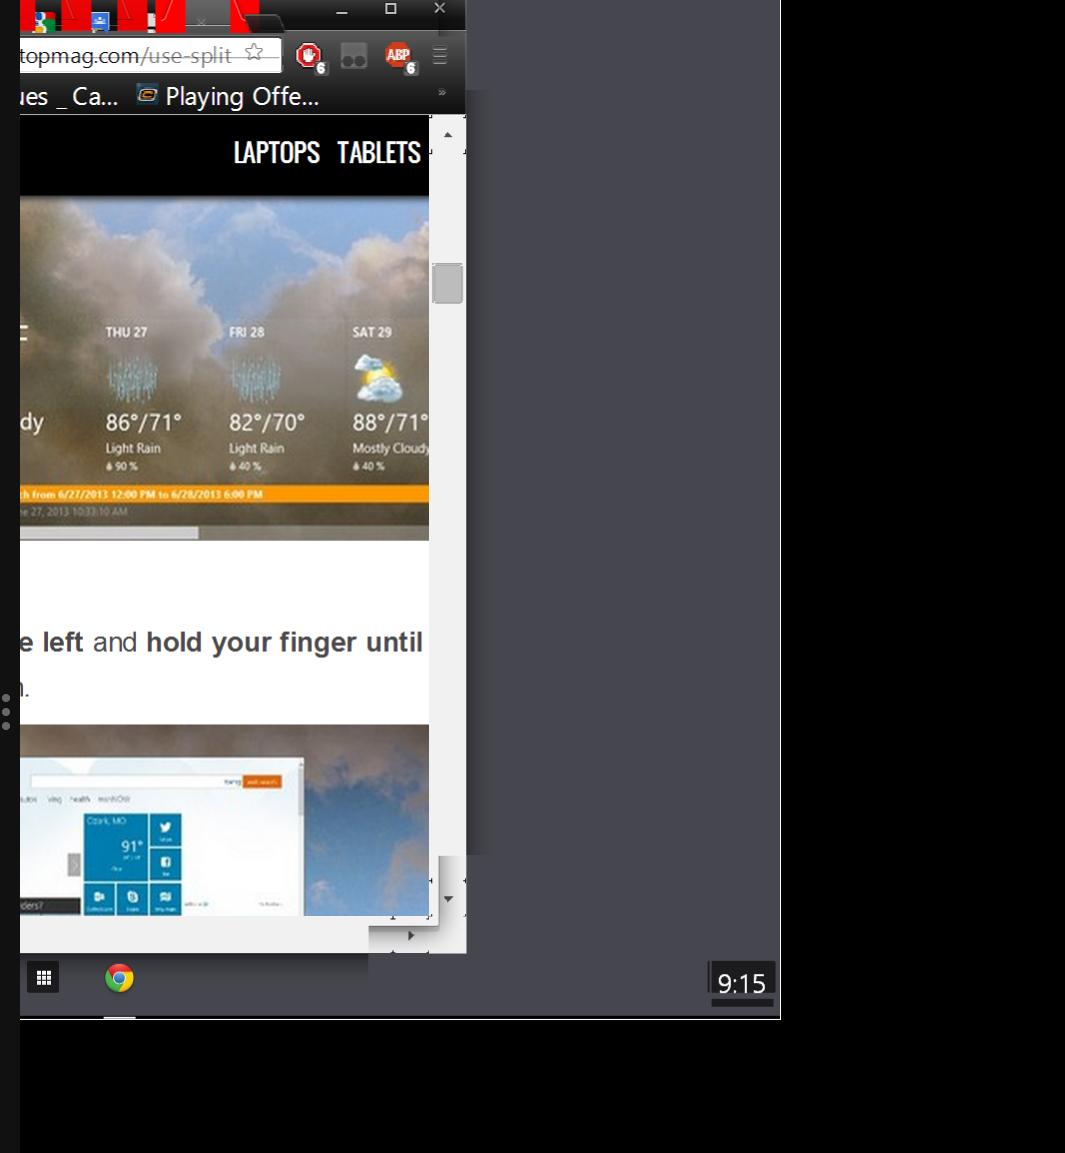 Google Chrome windows 8 mode (metro mode) is really weird